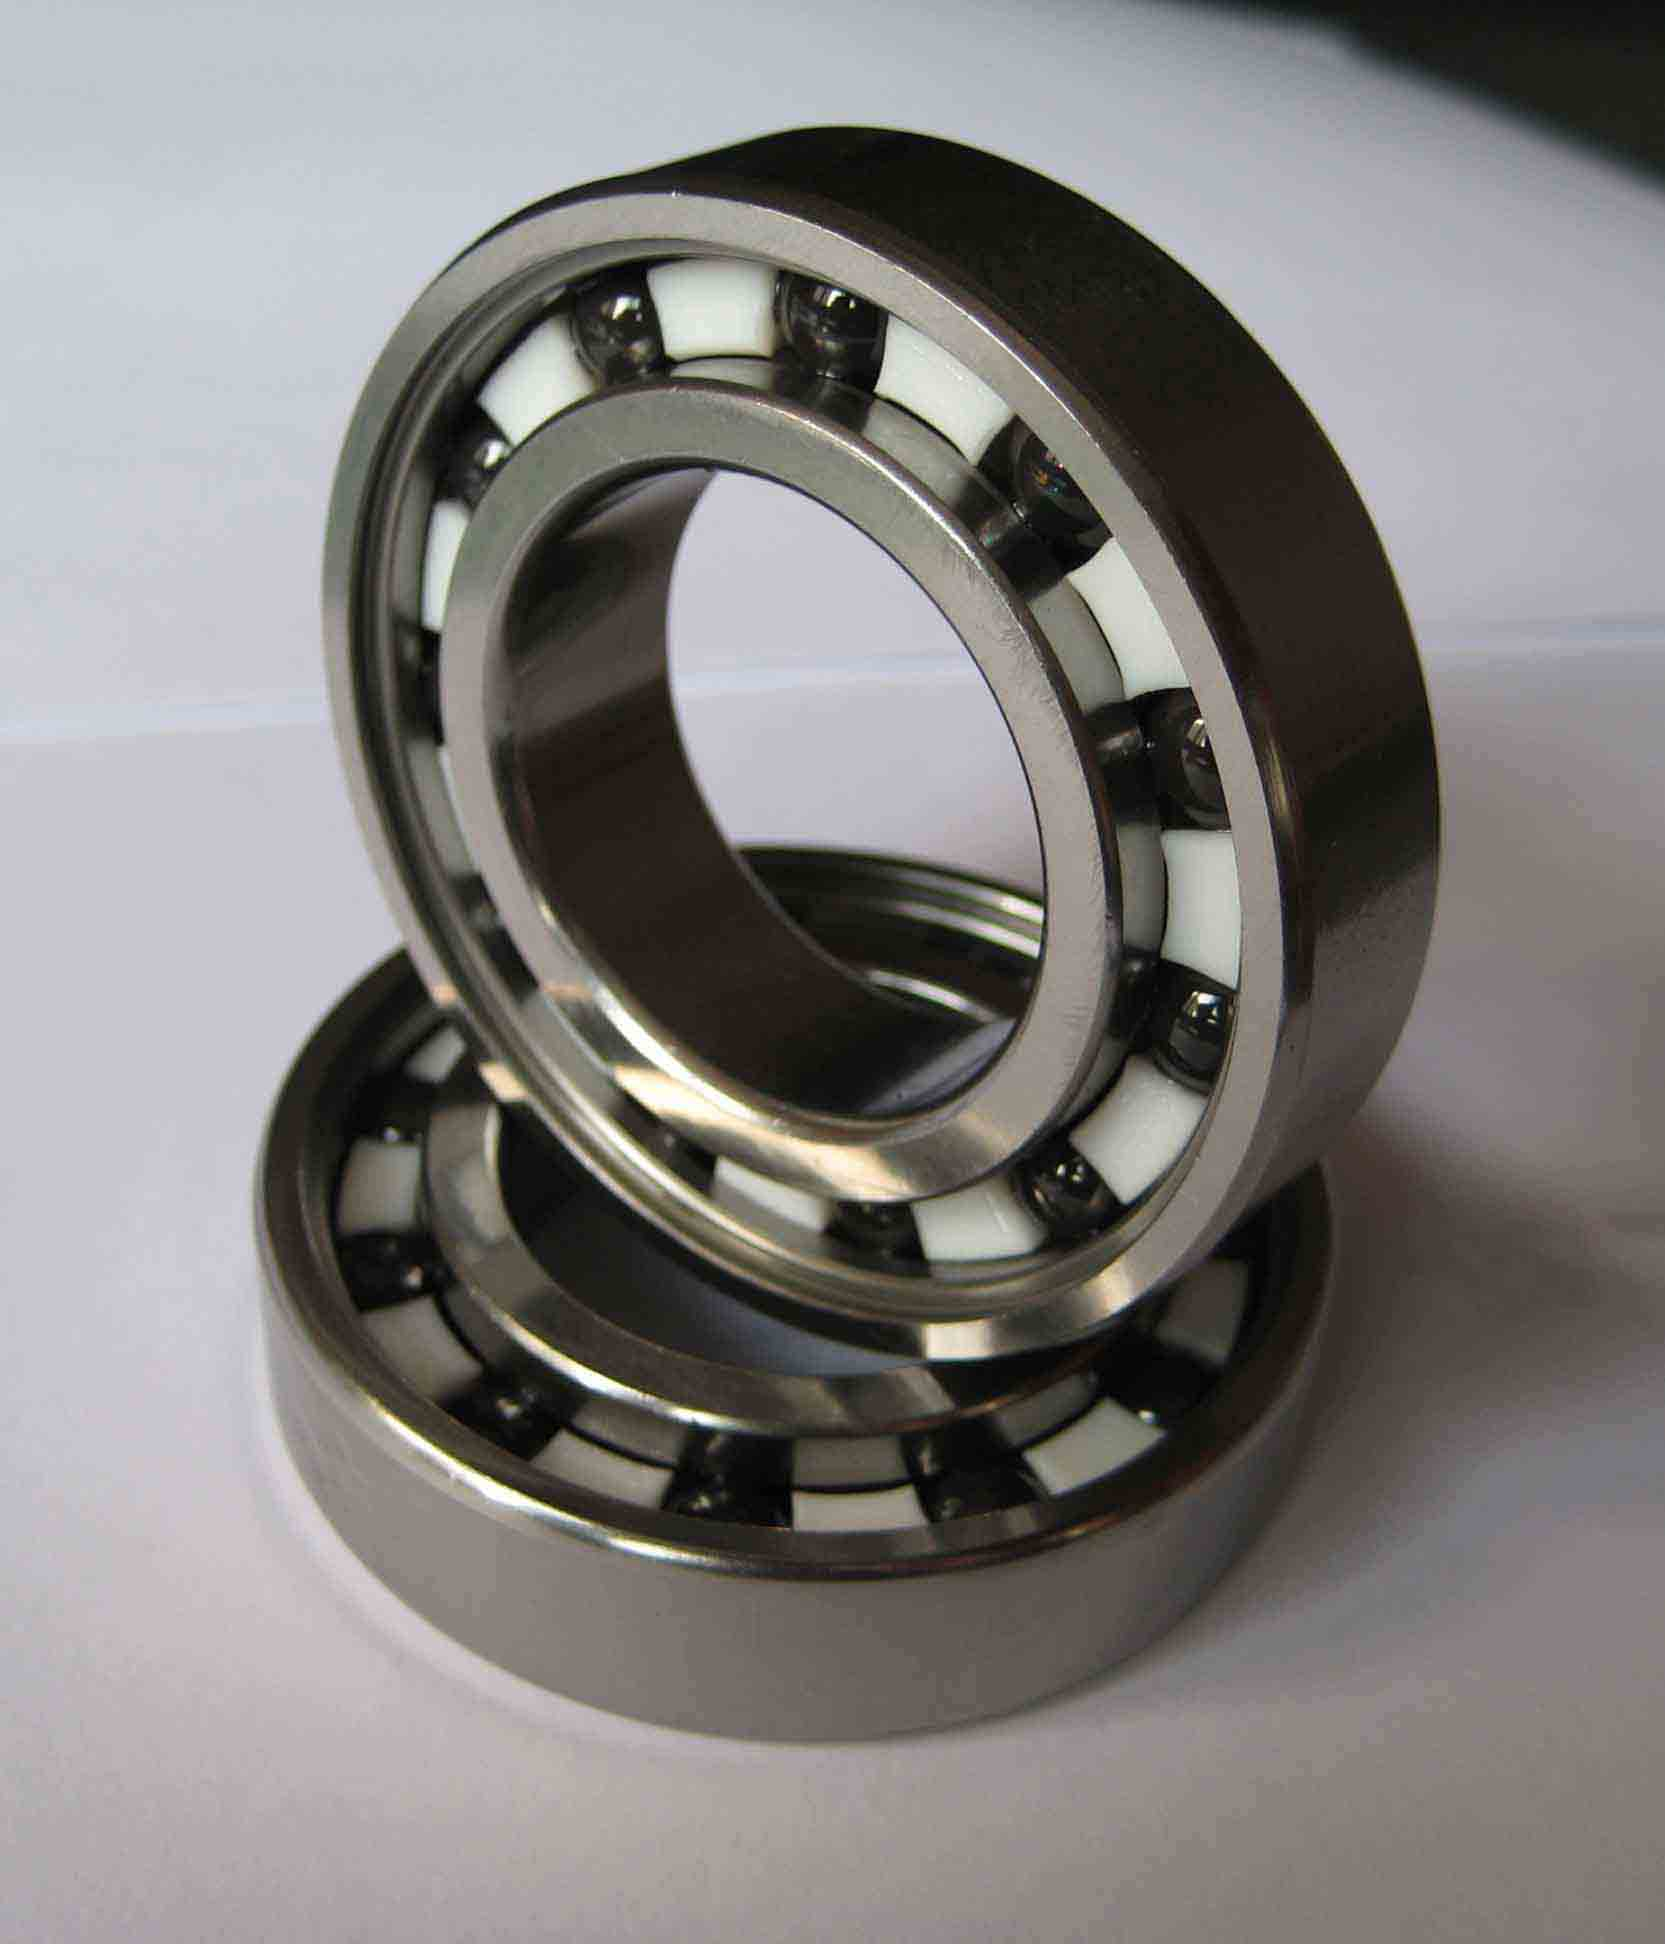 R1 Yamaha yzf1000R1 ecu flash, ceramic bearings Factory Pro